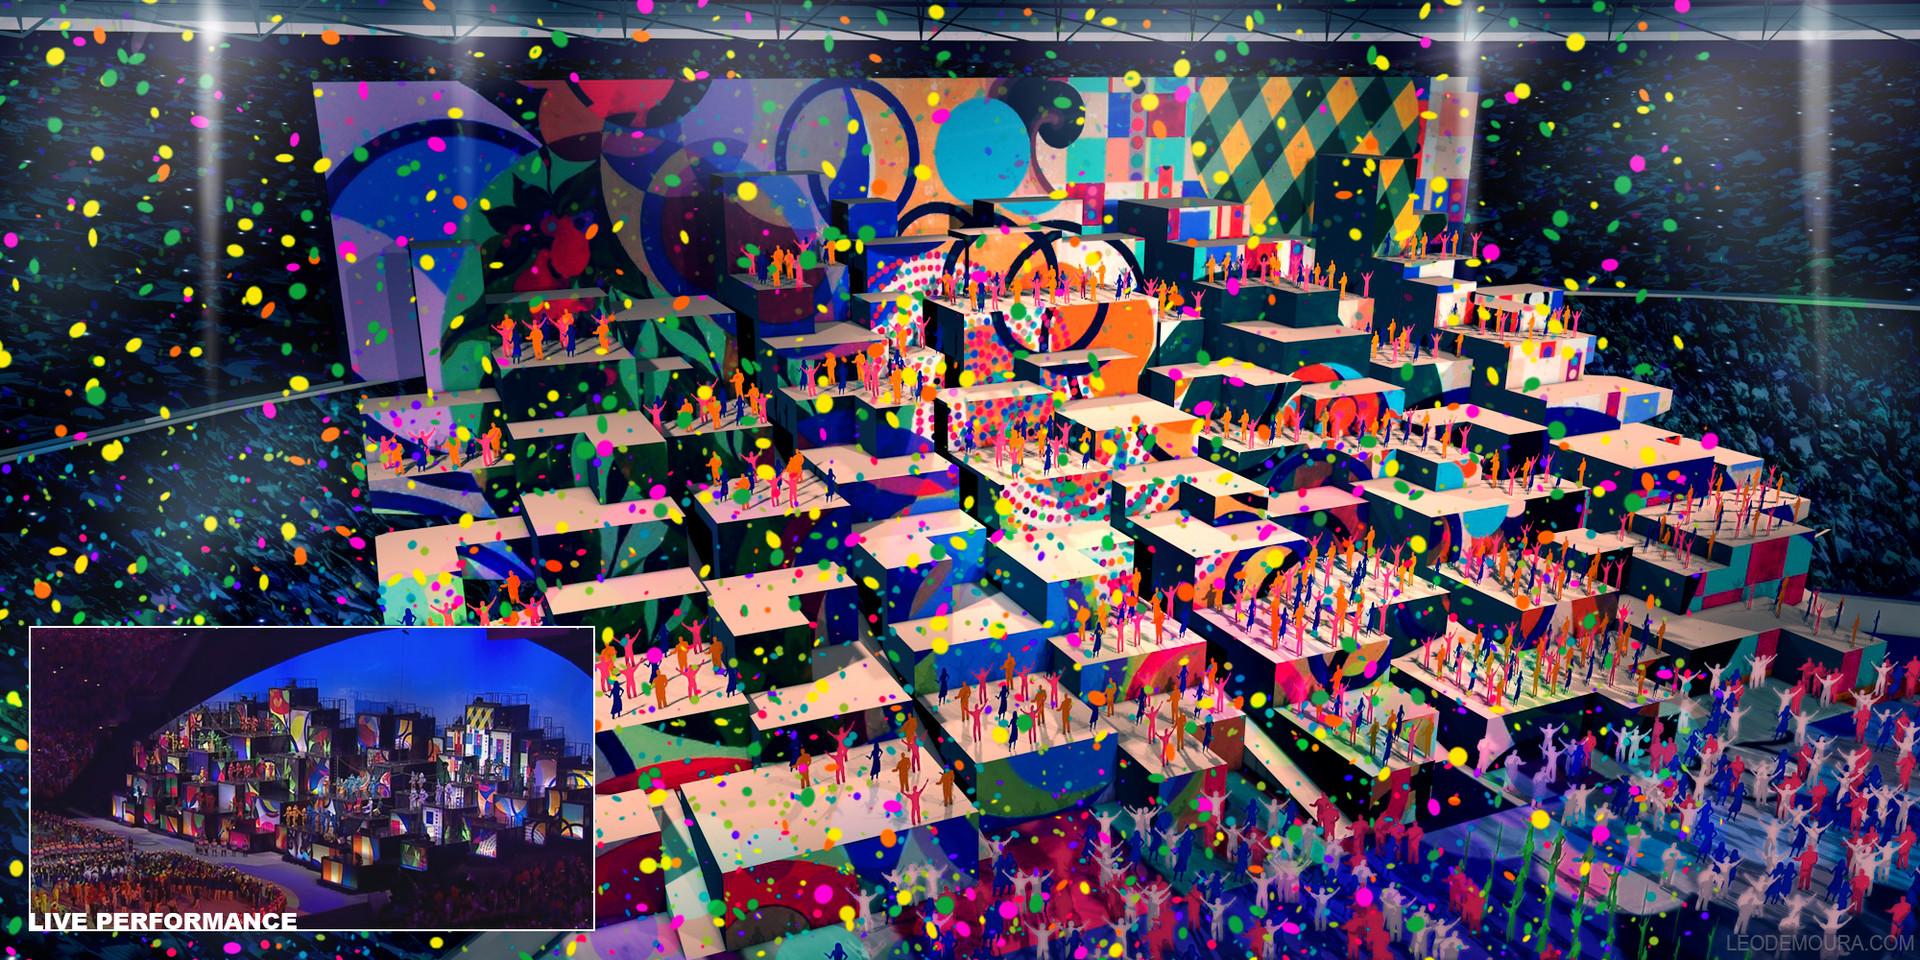 Leonardo de moura art ooc seg maracana v00 lmo 20150808 apotheosis 01 edited